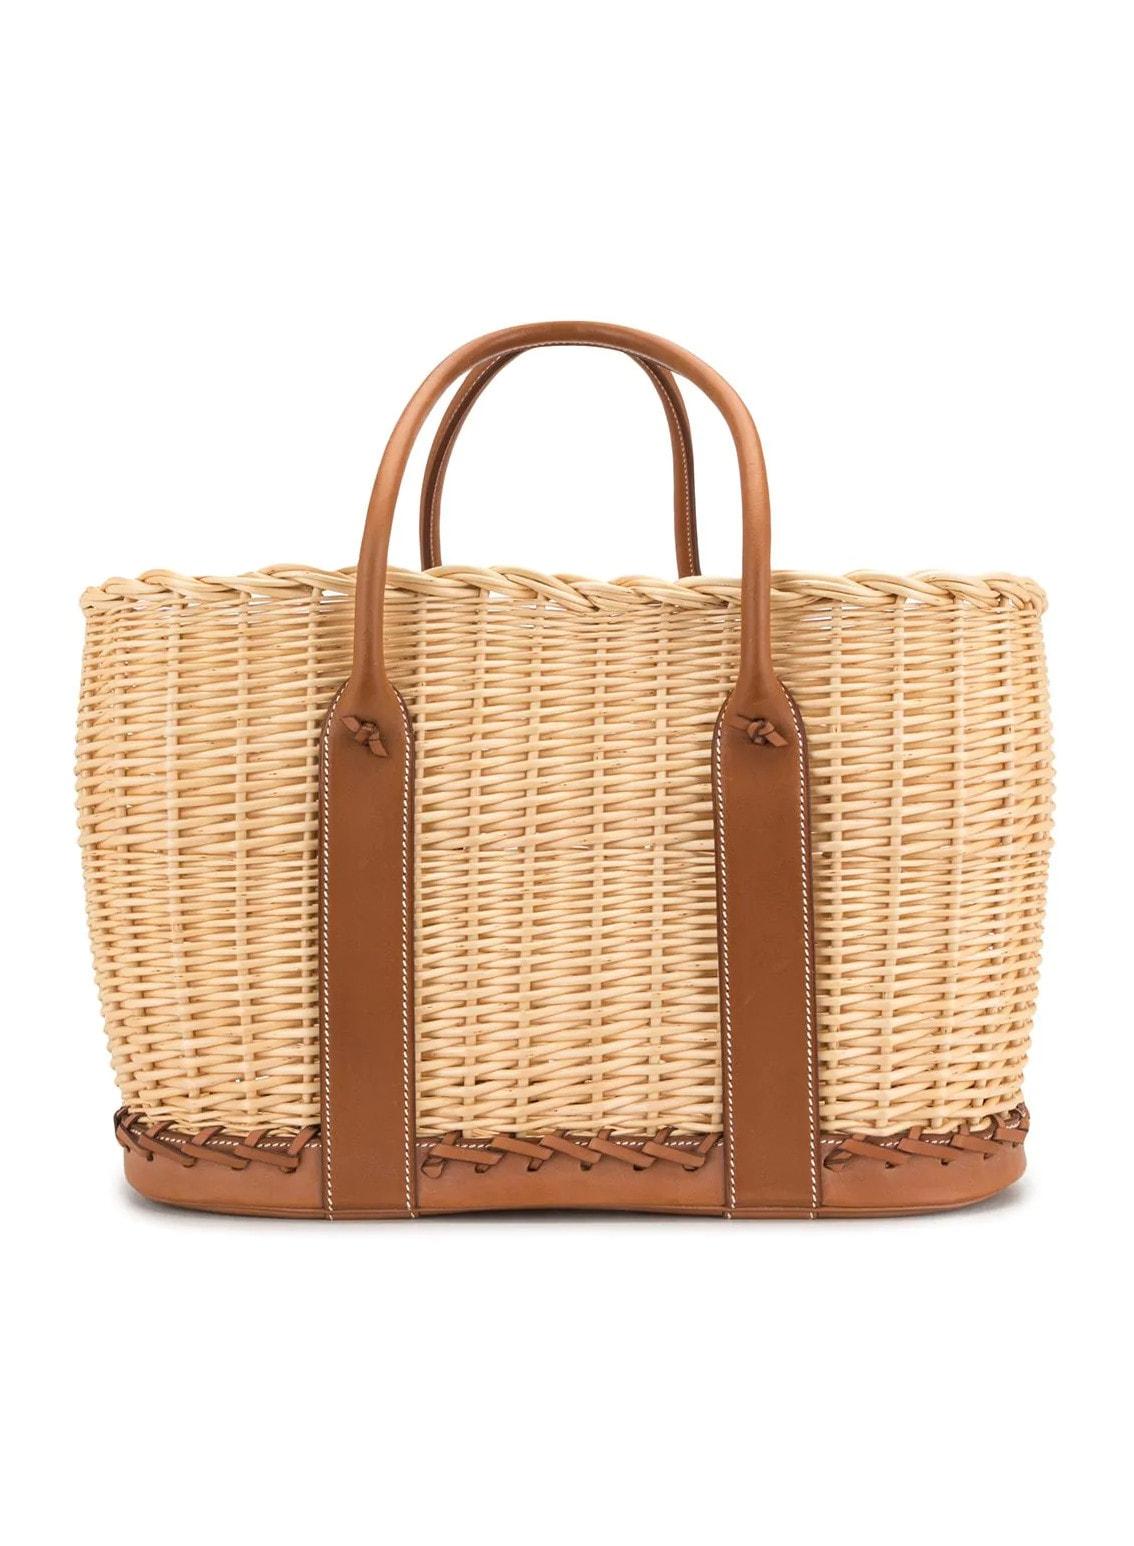 Hermès Rattan Bag